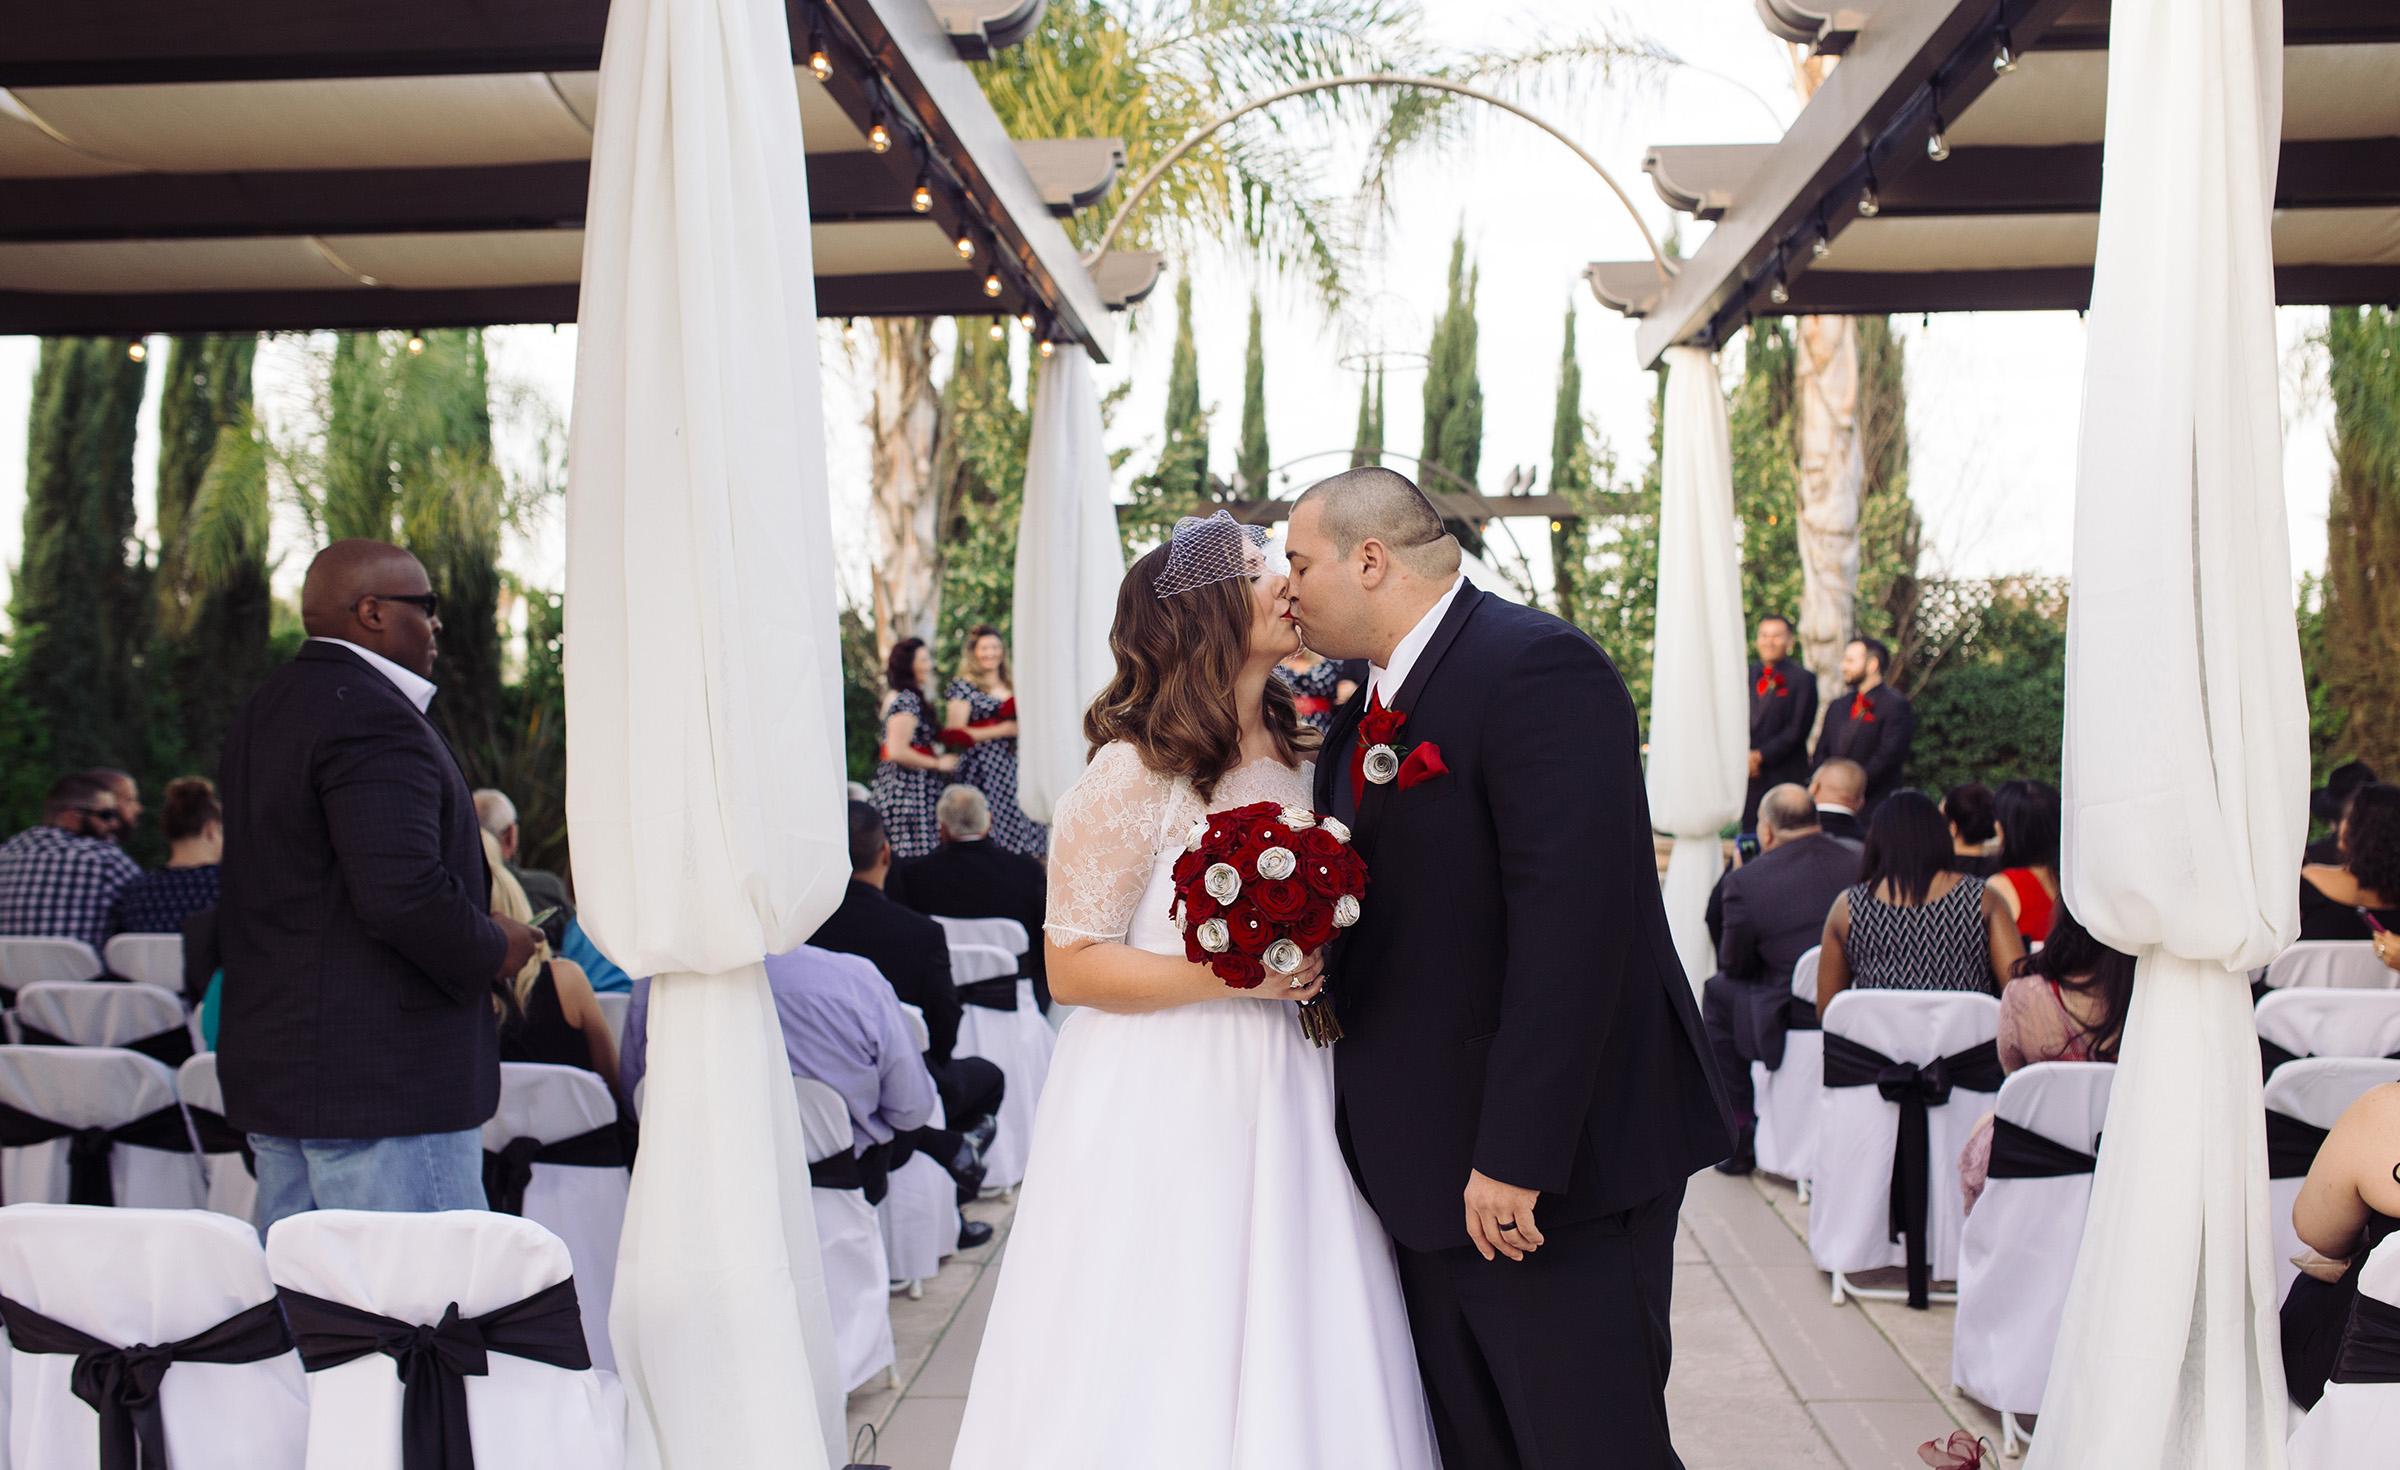 First walk husband and wife - Fresno - Fresno, California - Frenso County - Wedgewood Weddngs